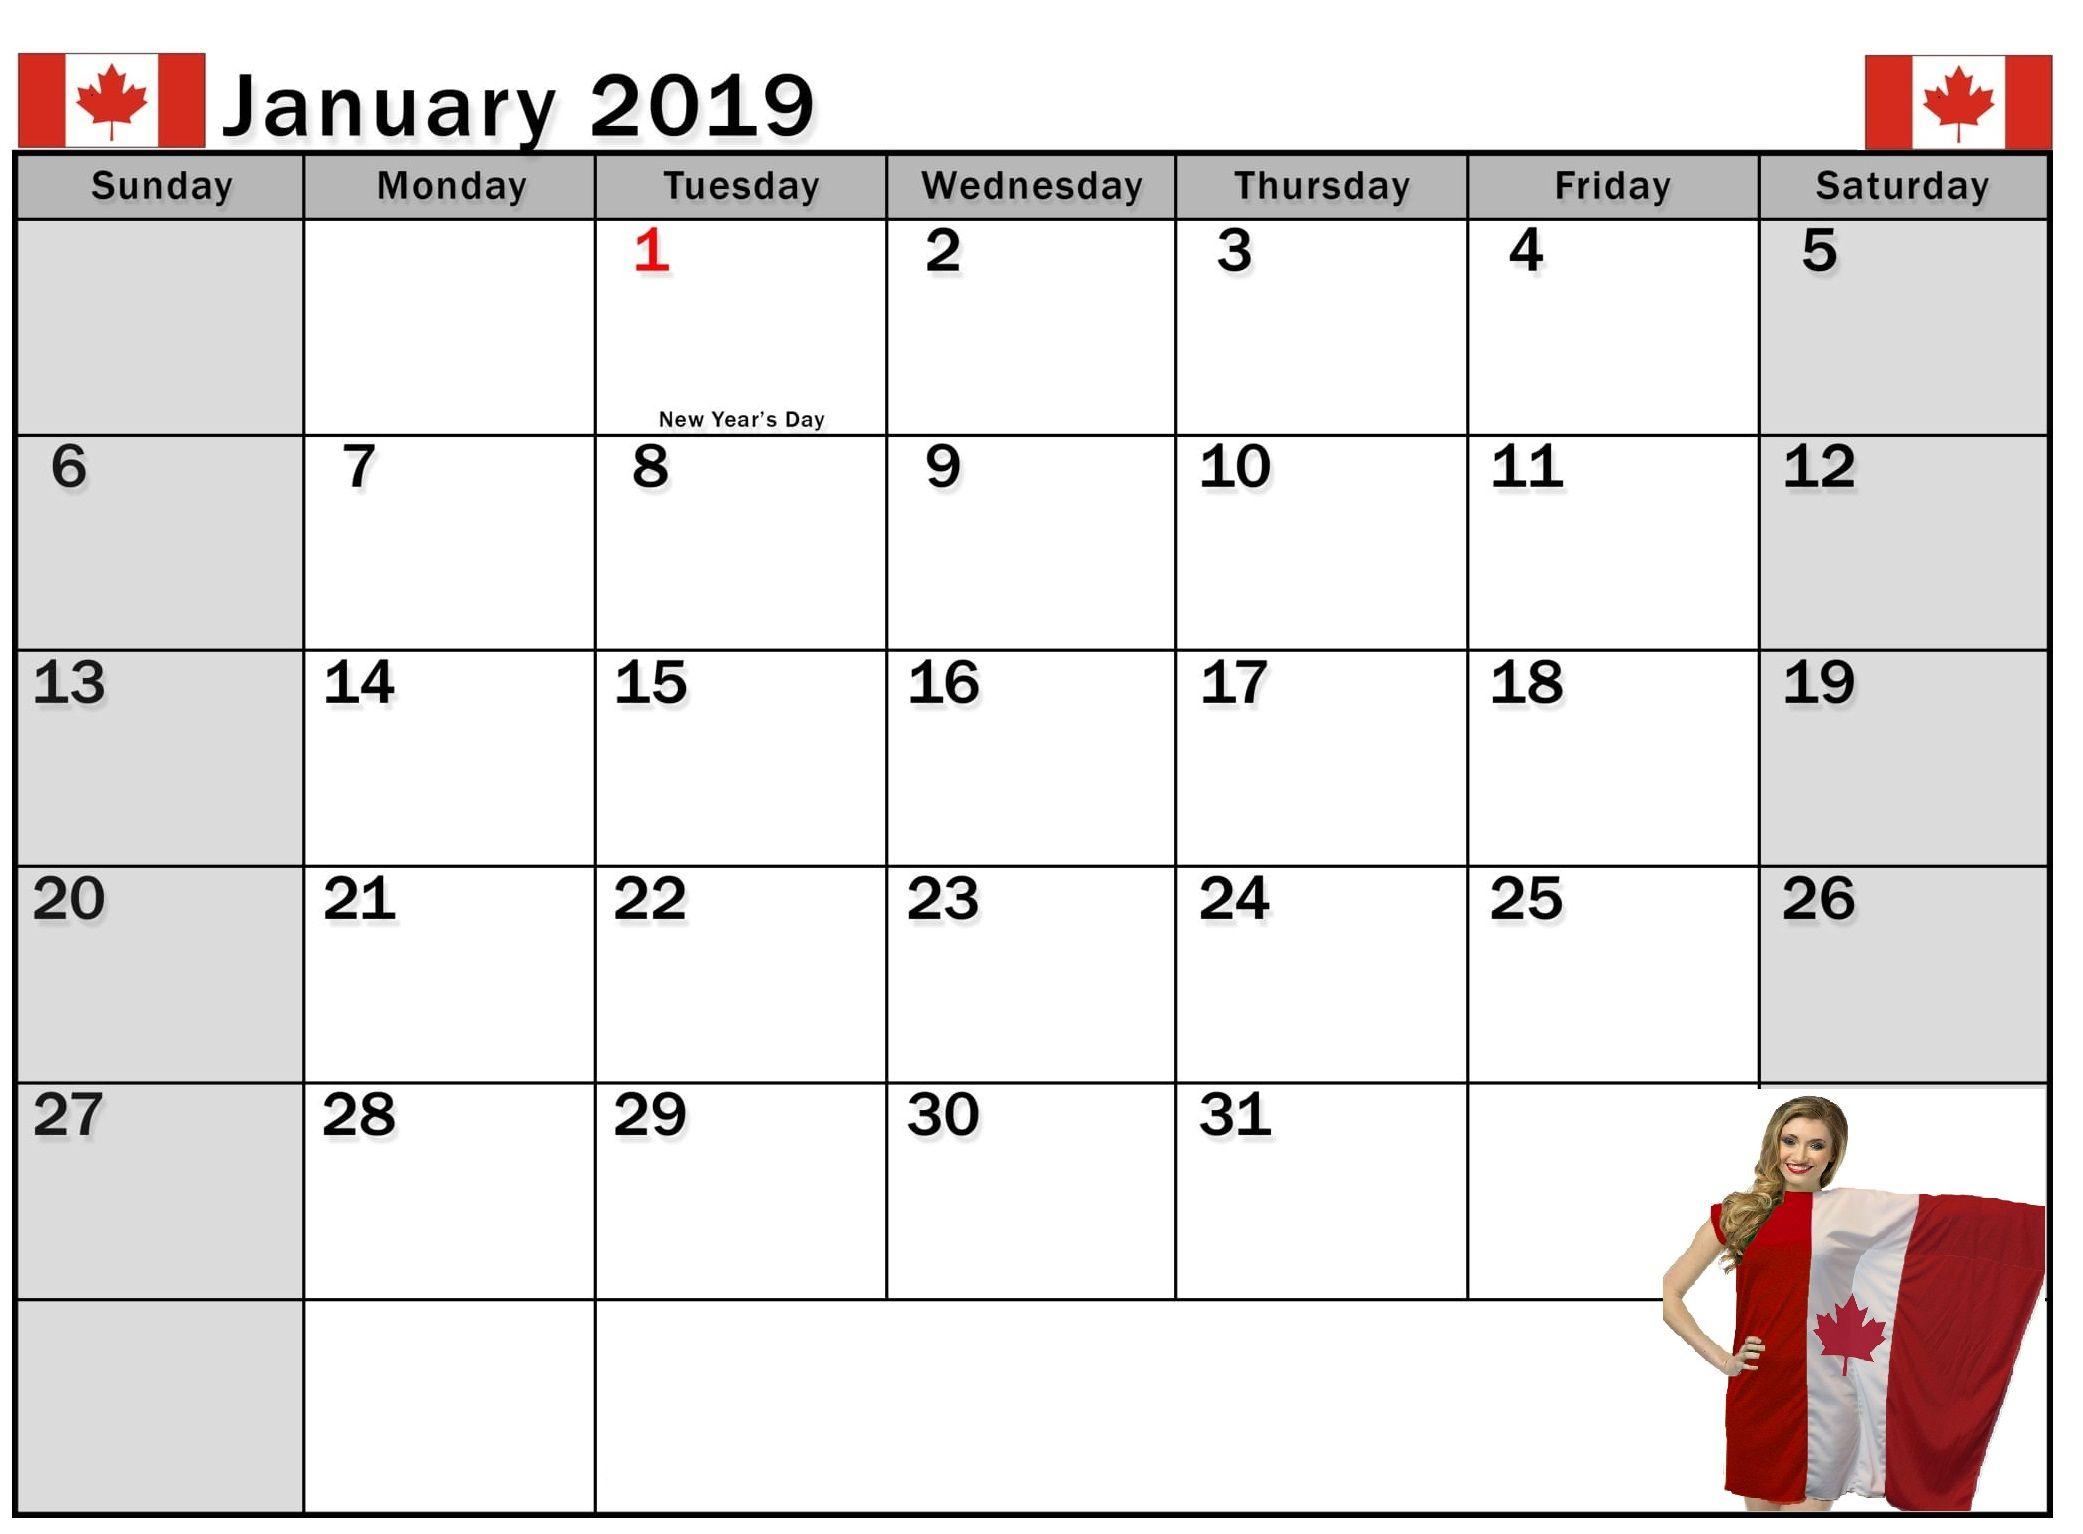 january 2019 calendar canada with holidays